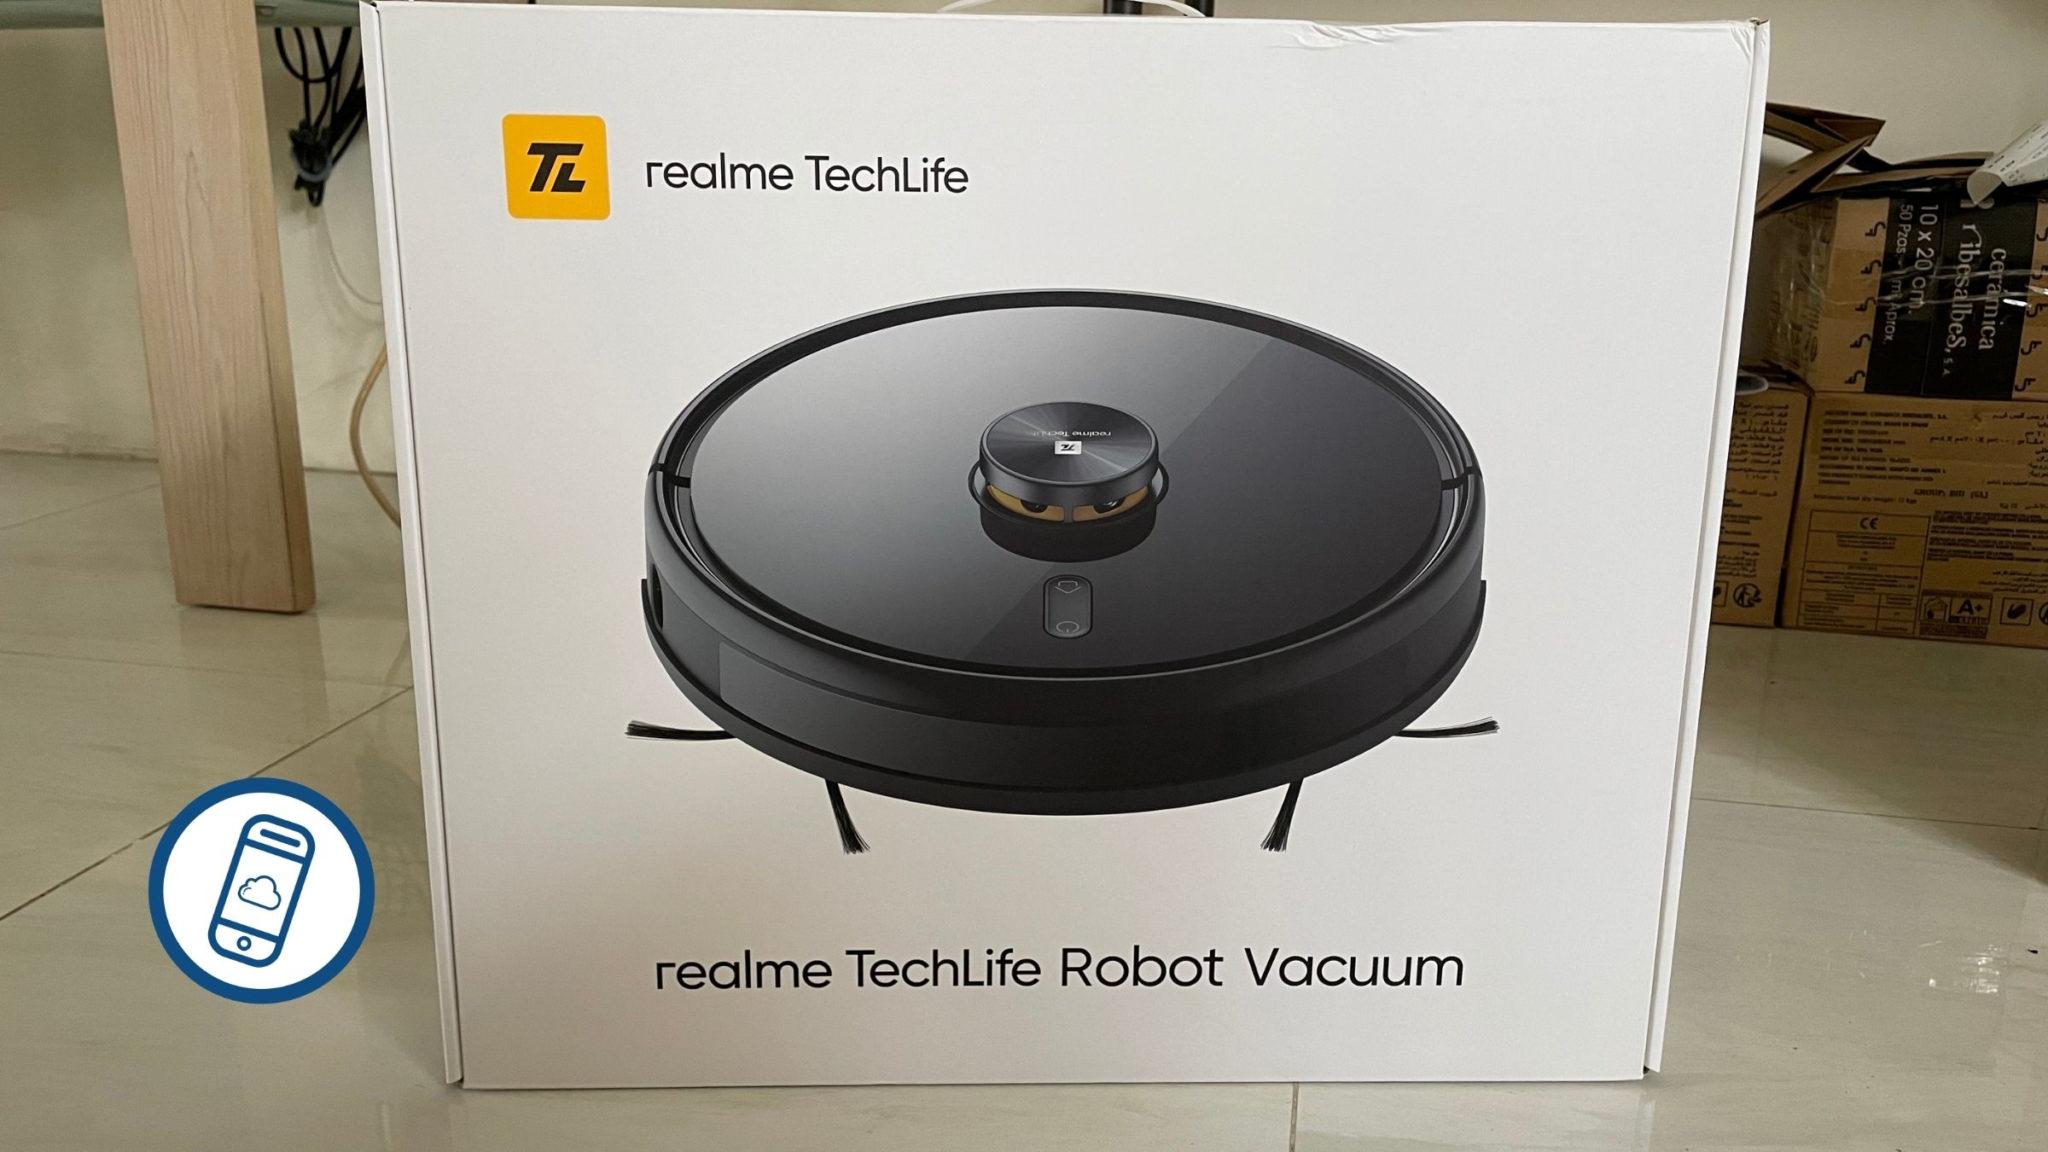 realme TechLife Robot Vacuum First Impressions Header